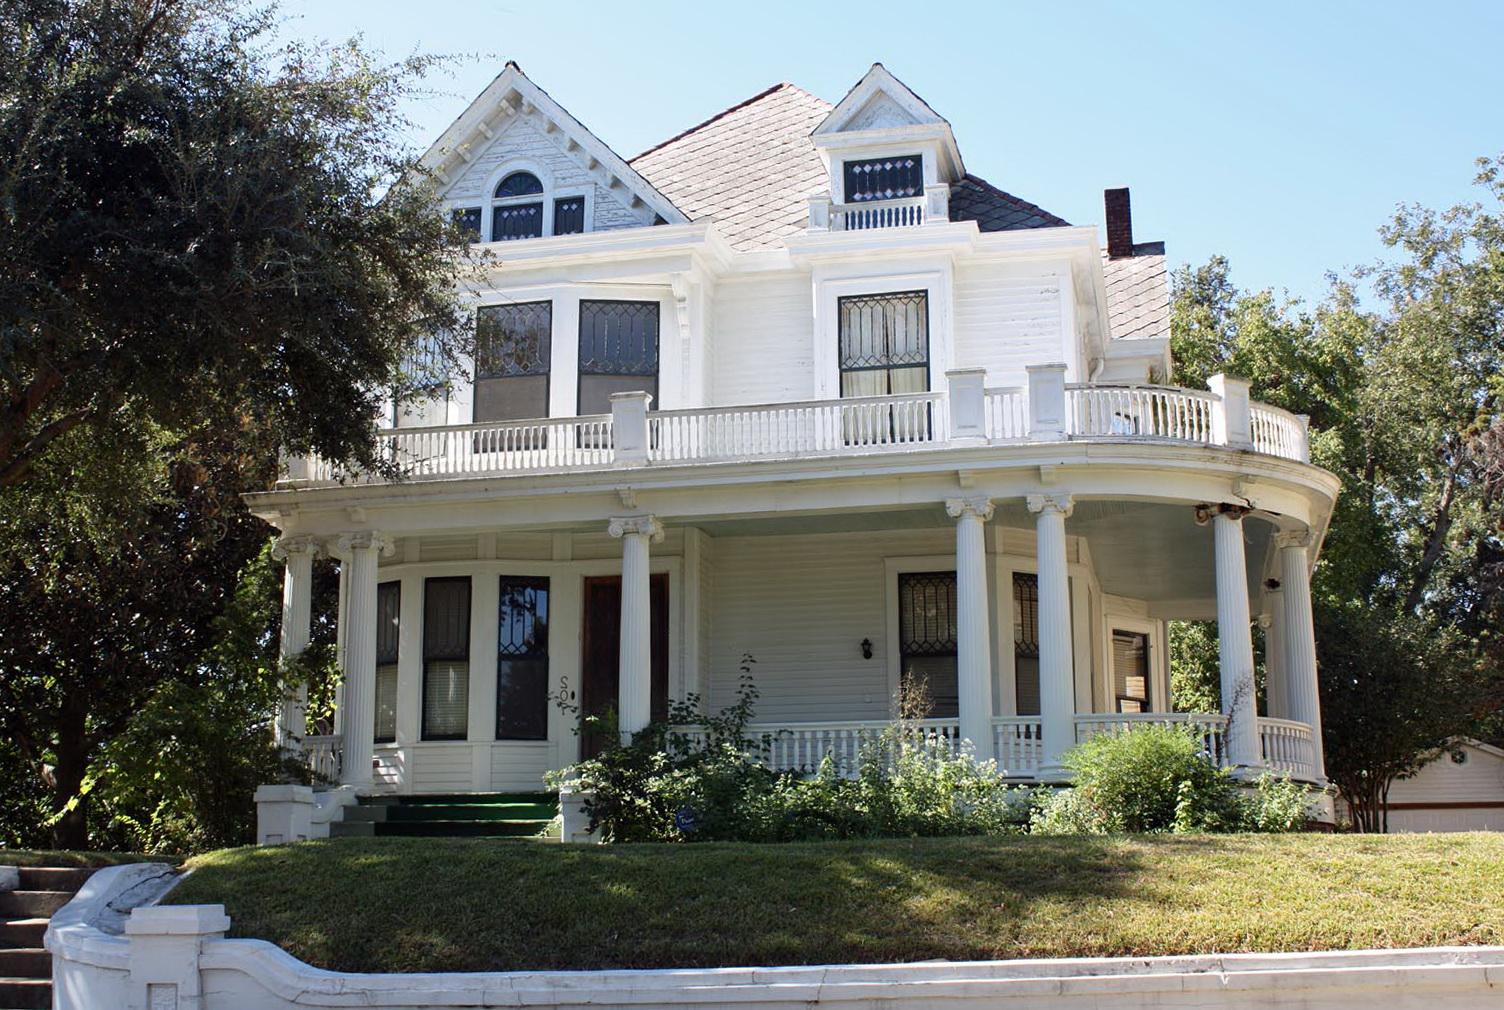 Farmhouse House Plans With Wrap Around Porch Home Design